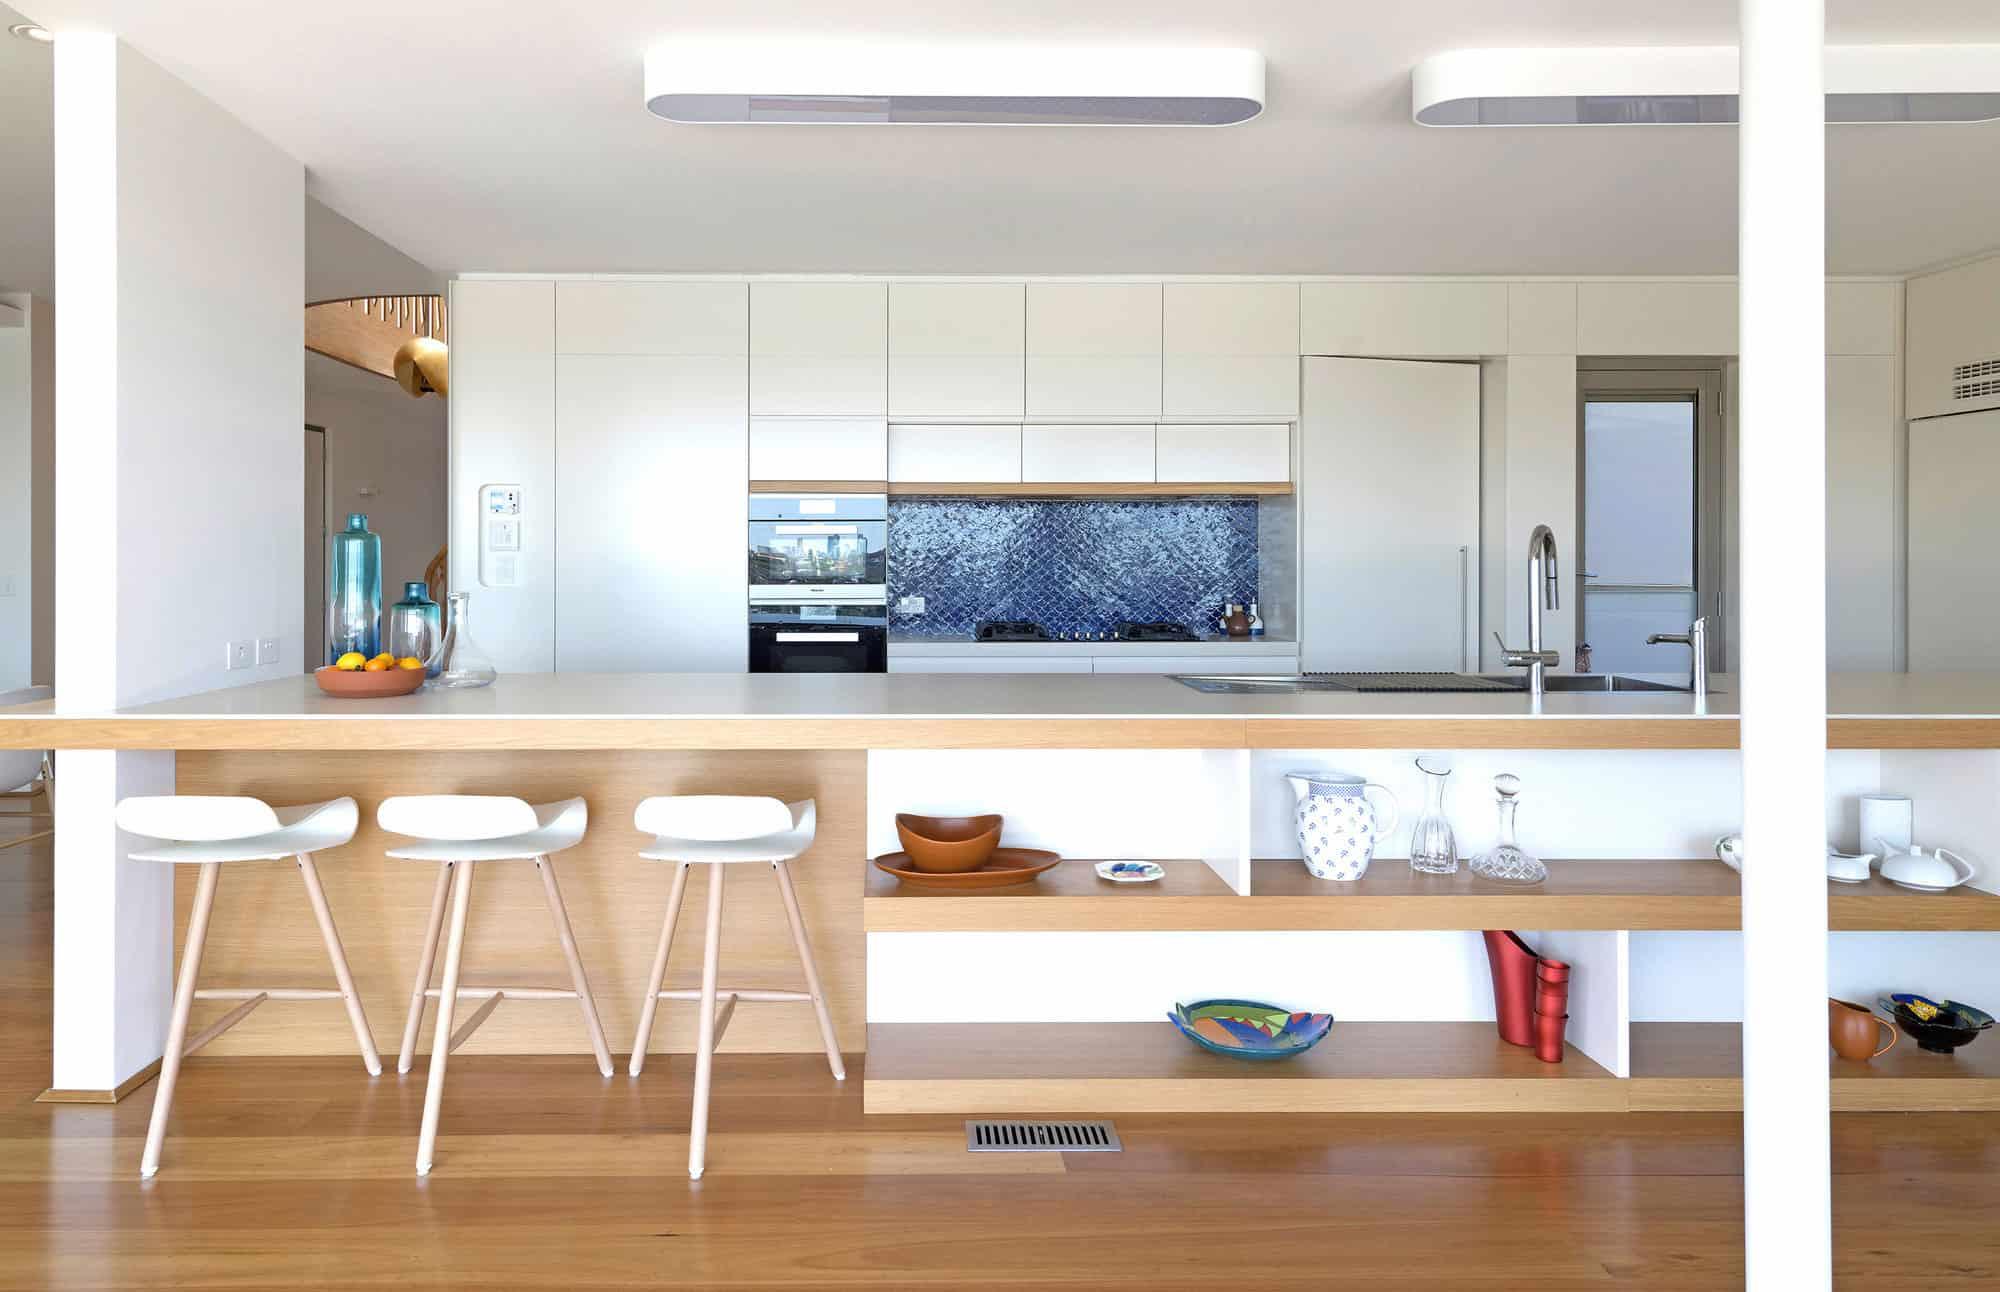 Luigi Rosselli Architects Renovate a Late 1950s Home in Australia